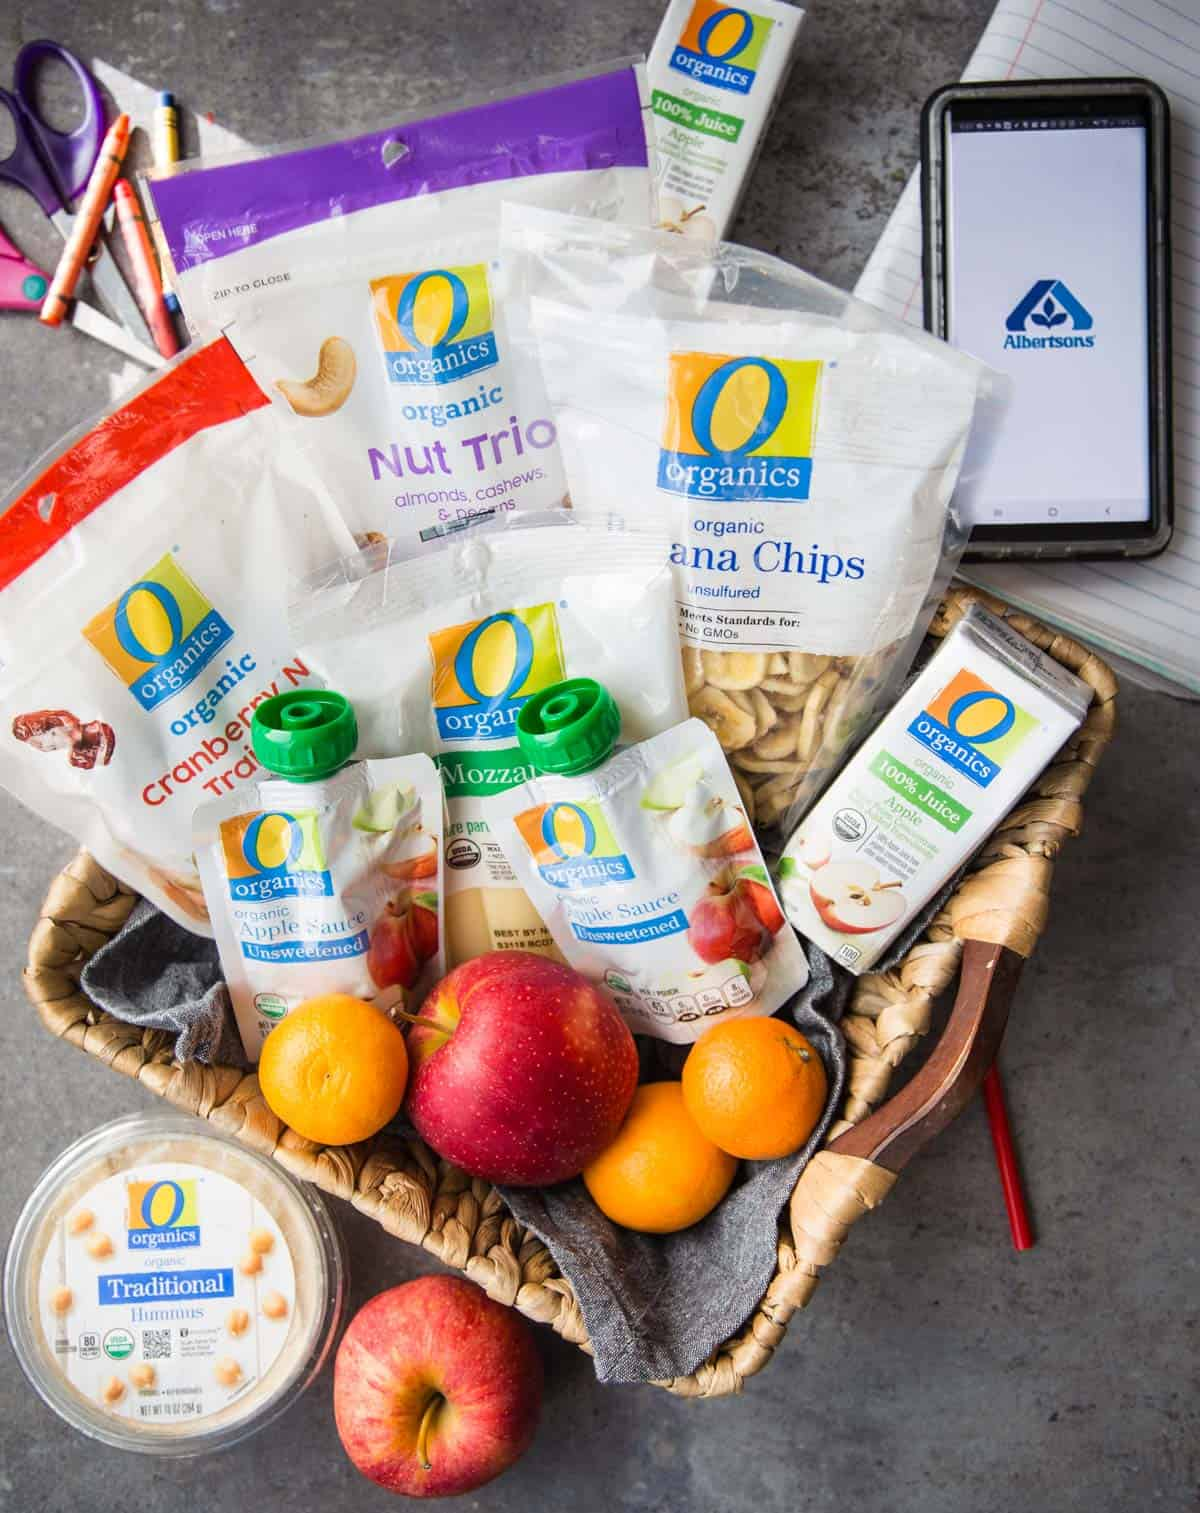 A basket full of O Organics snacks.